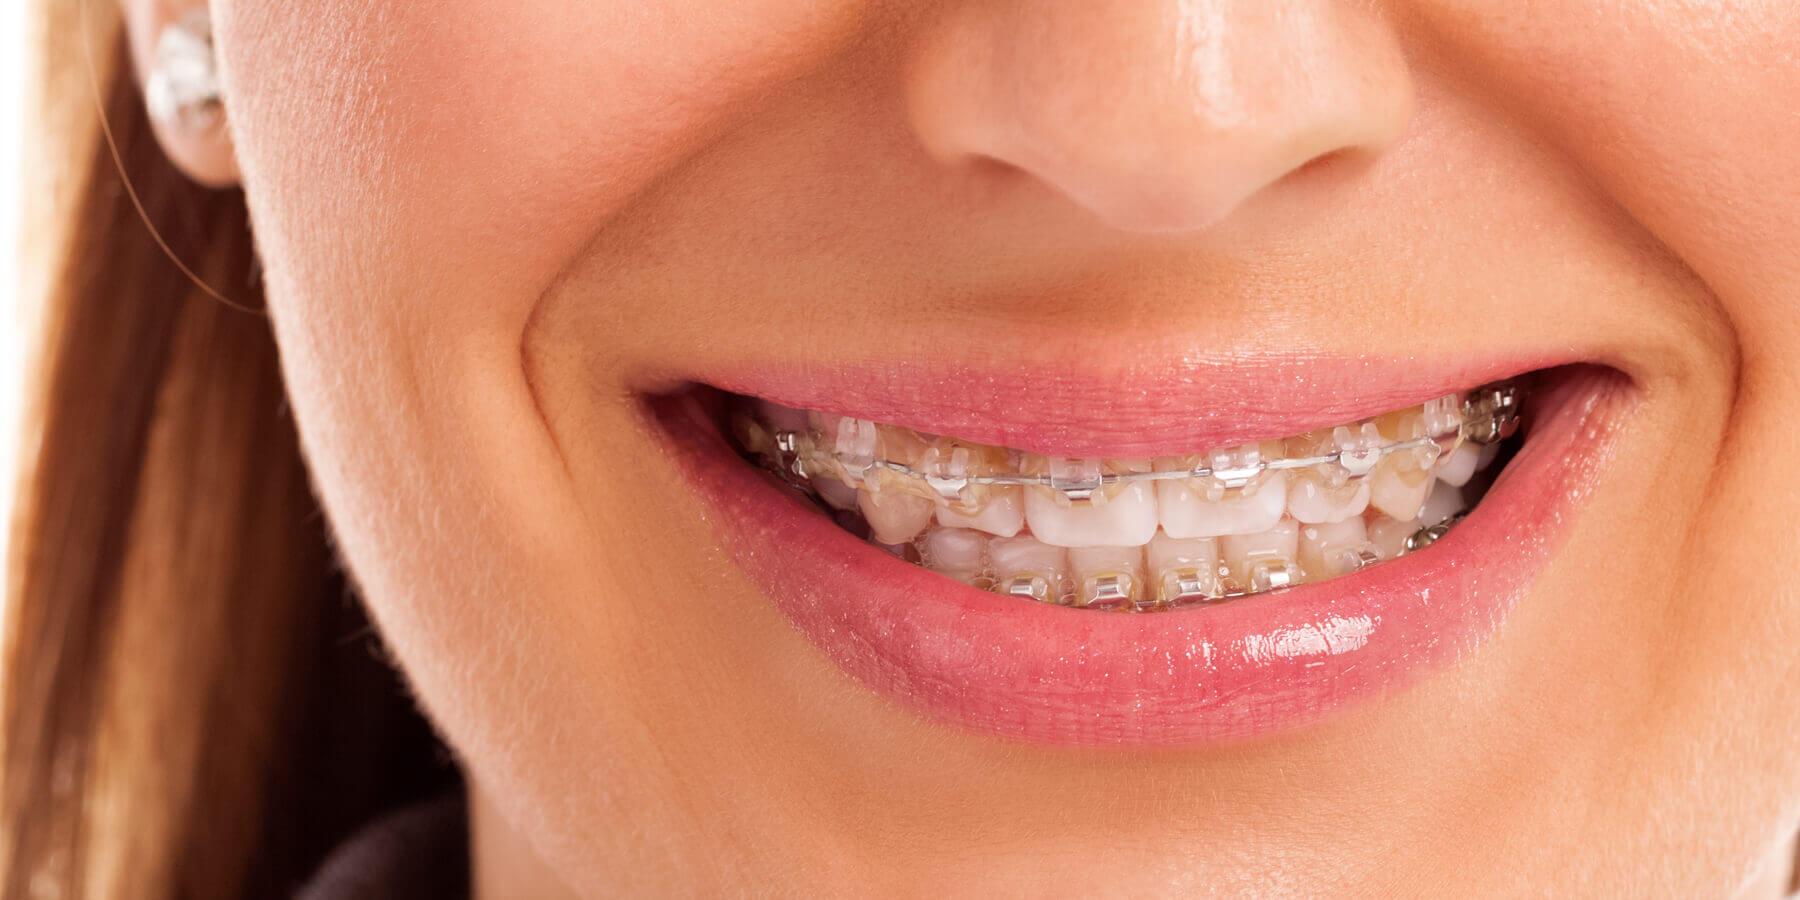 Plano Ortodontia